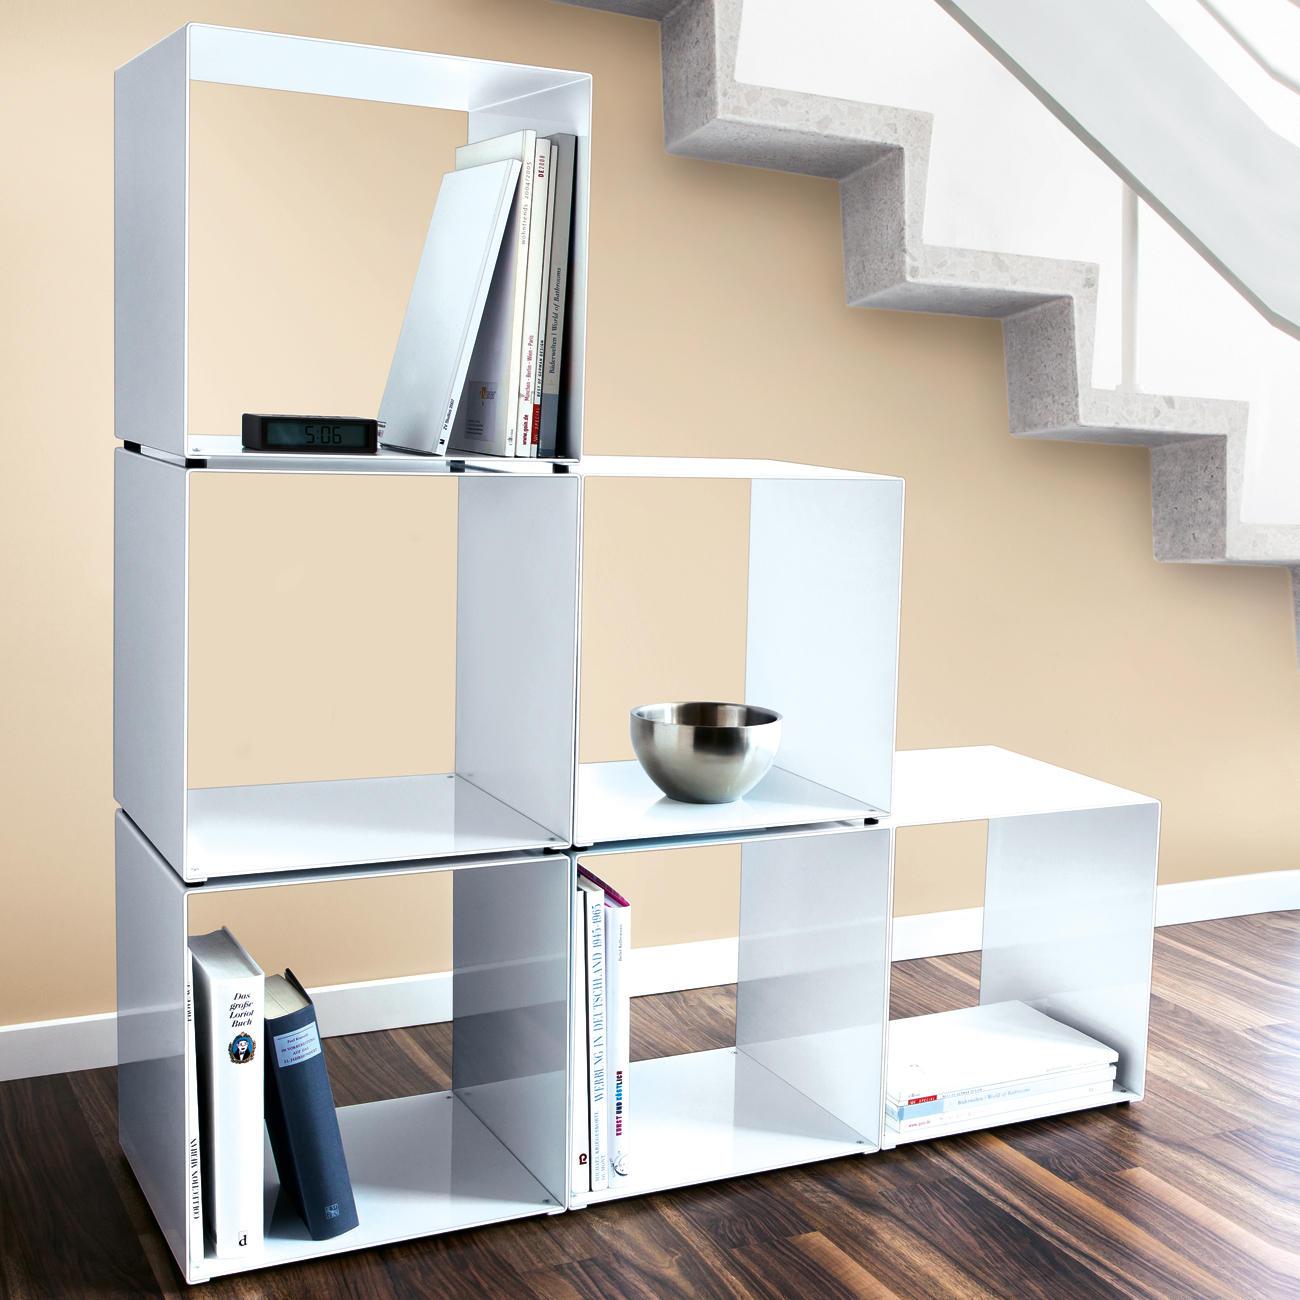 jan kurtz metall cubus w rfel wei online kaufen. Black Bedroom Furniture Sets. Home Design Ideas